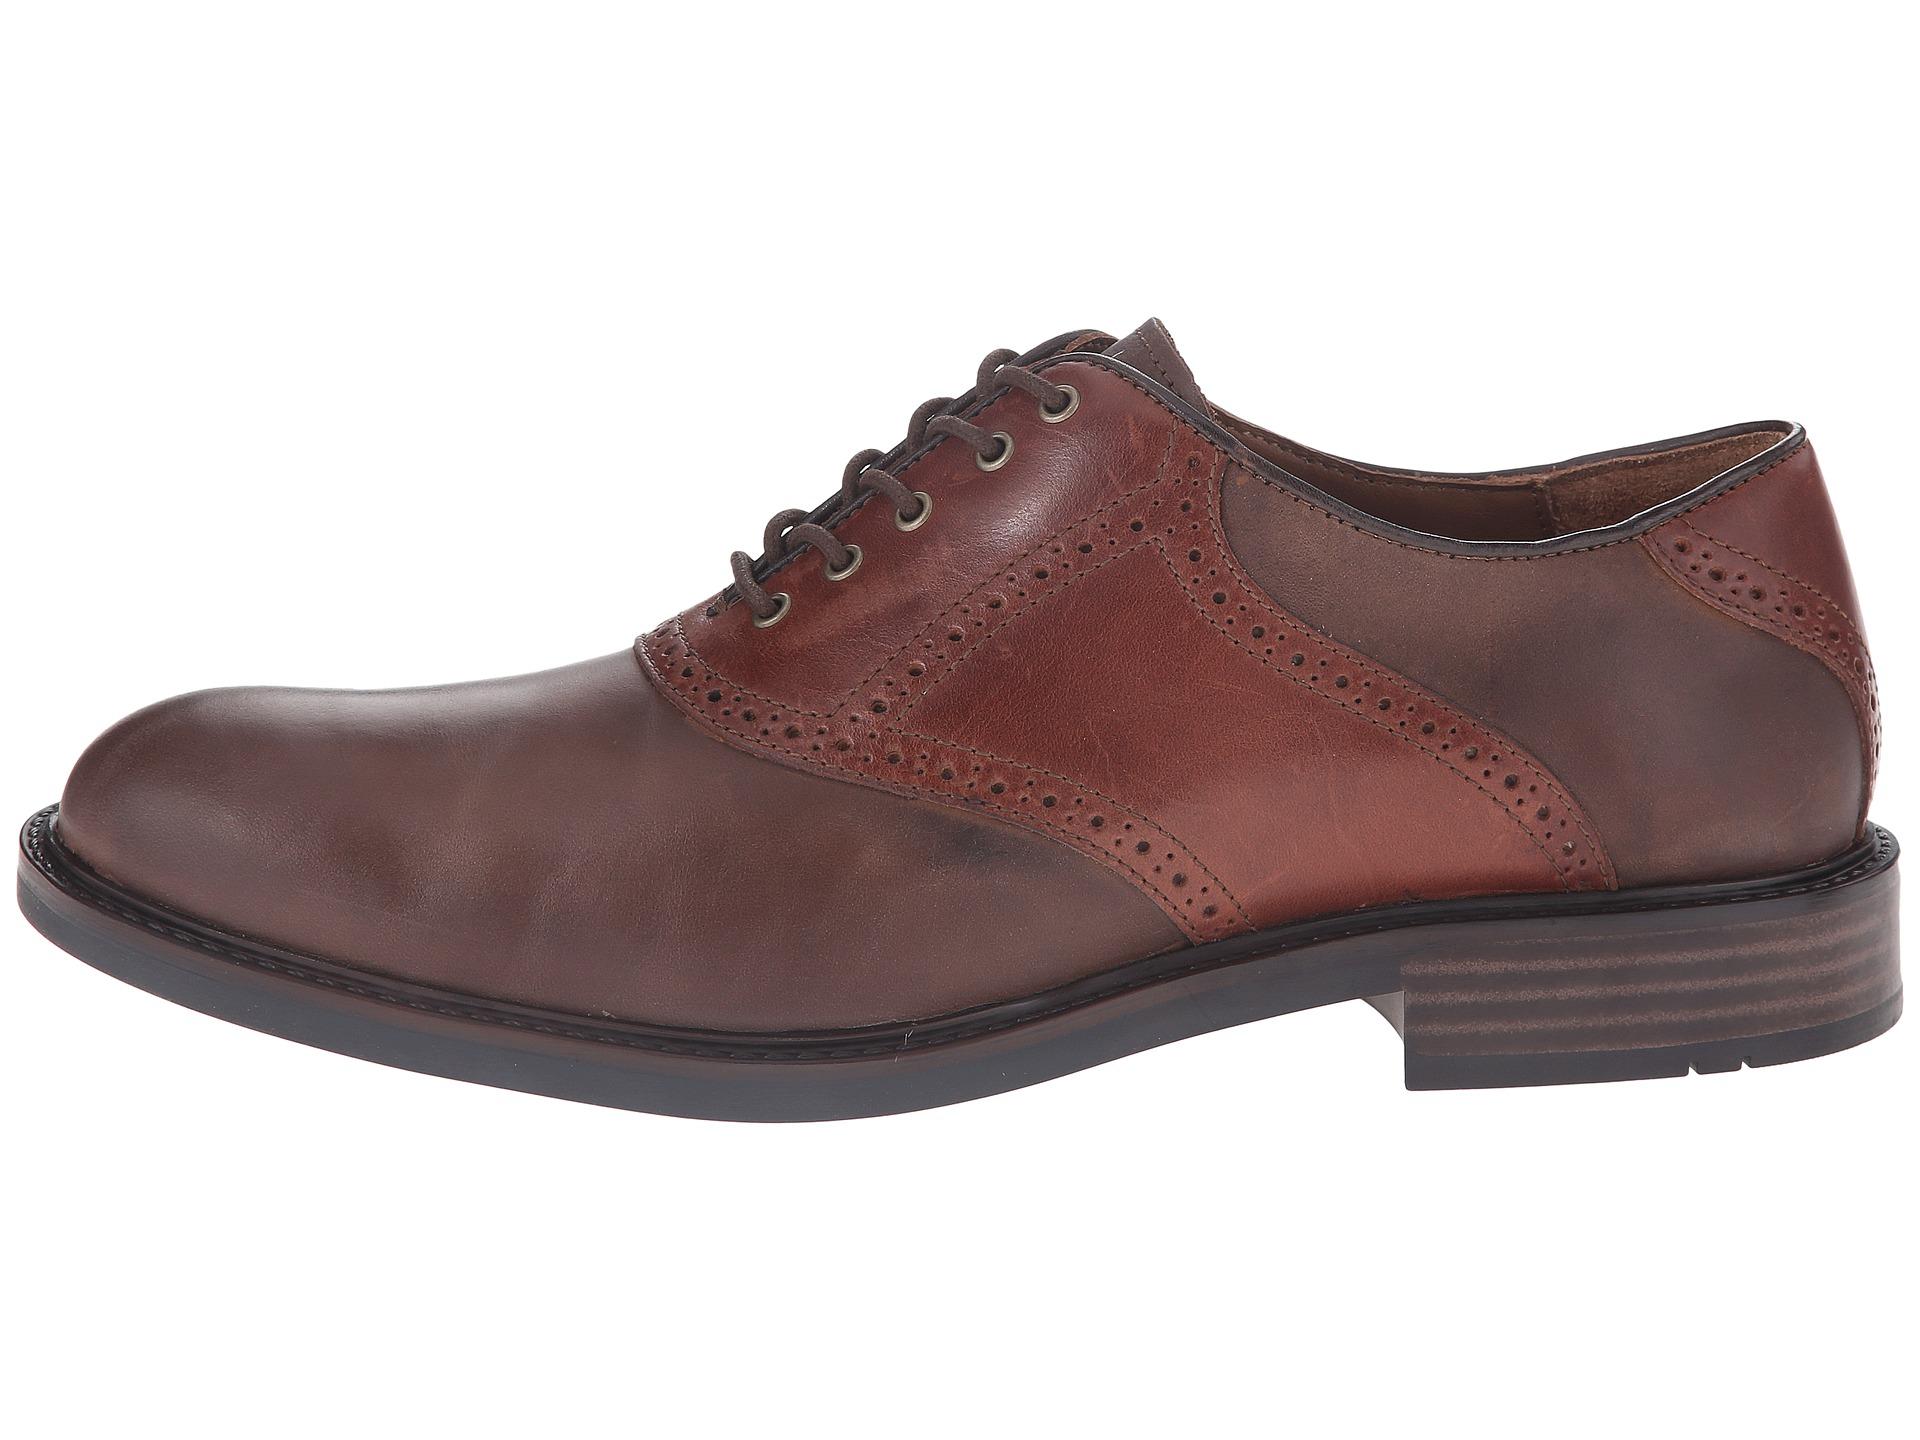 Johnston And Murphy Sale Saddle Shoes